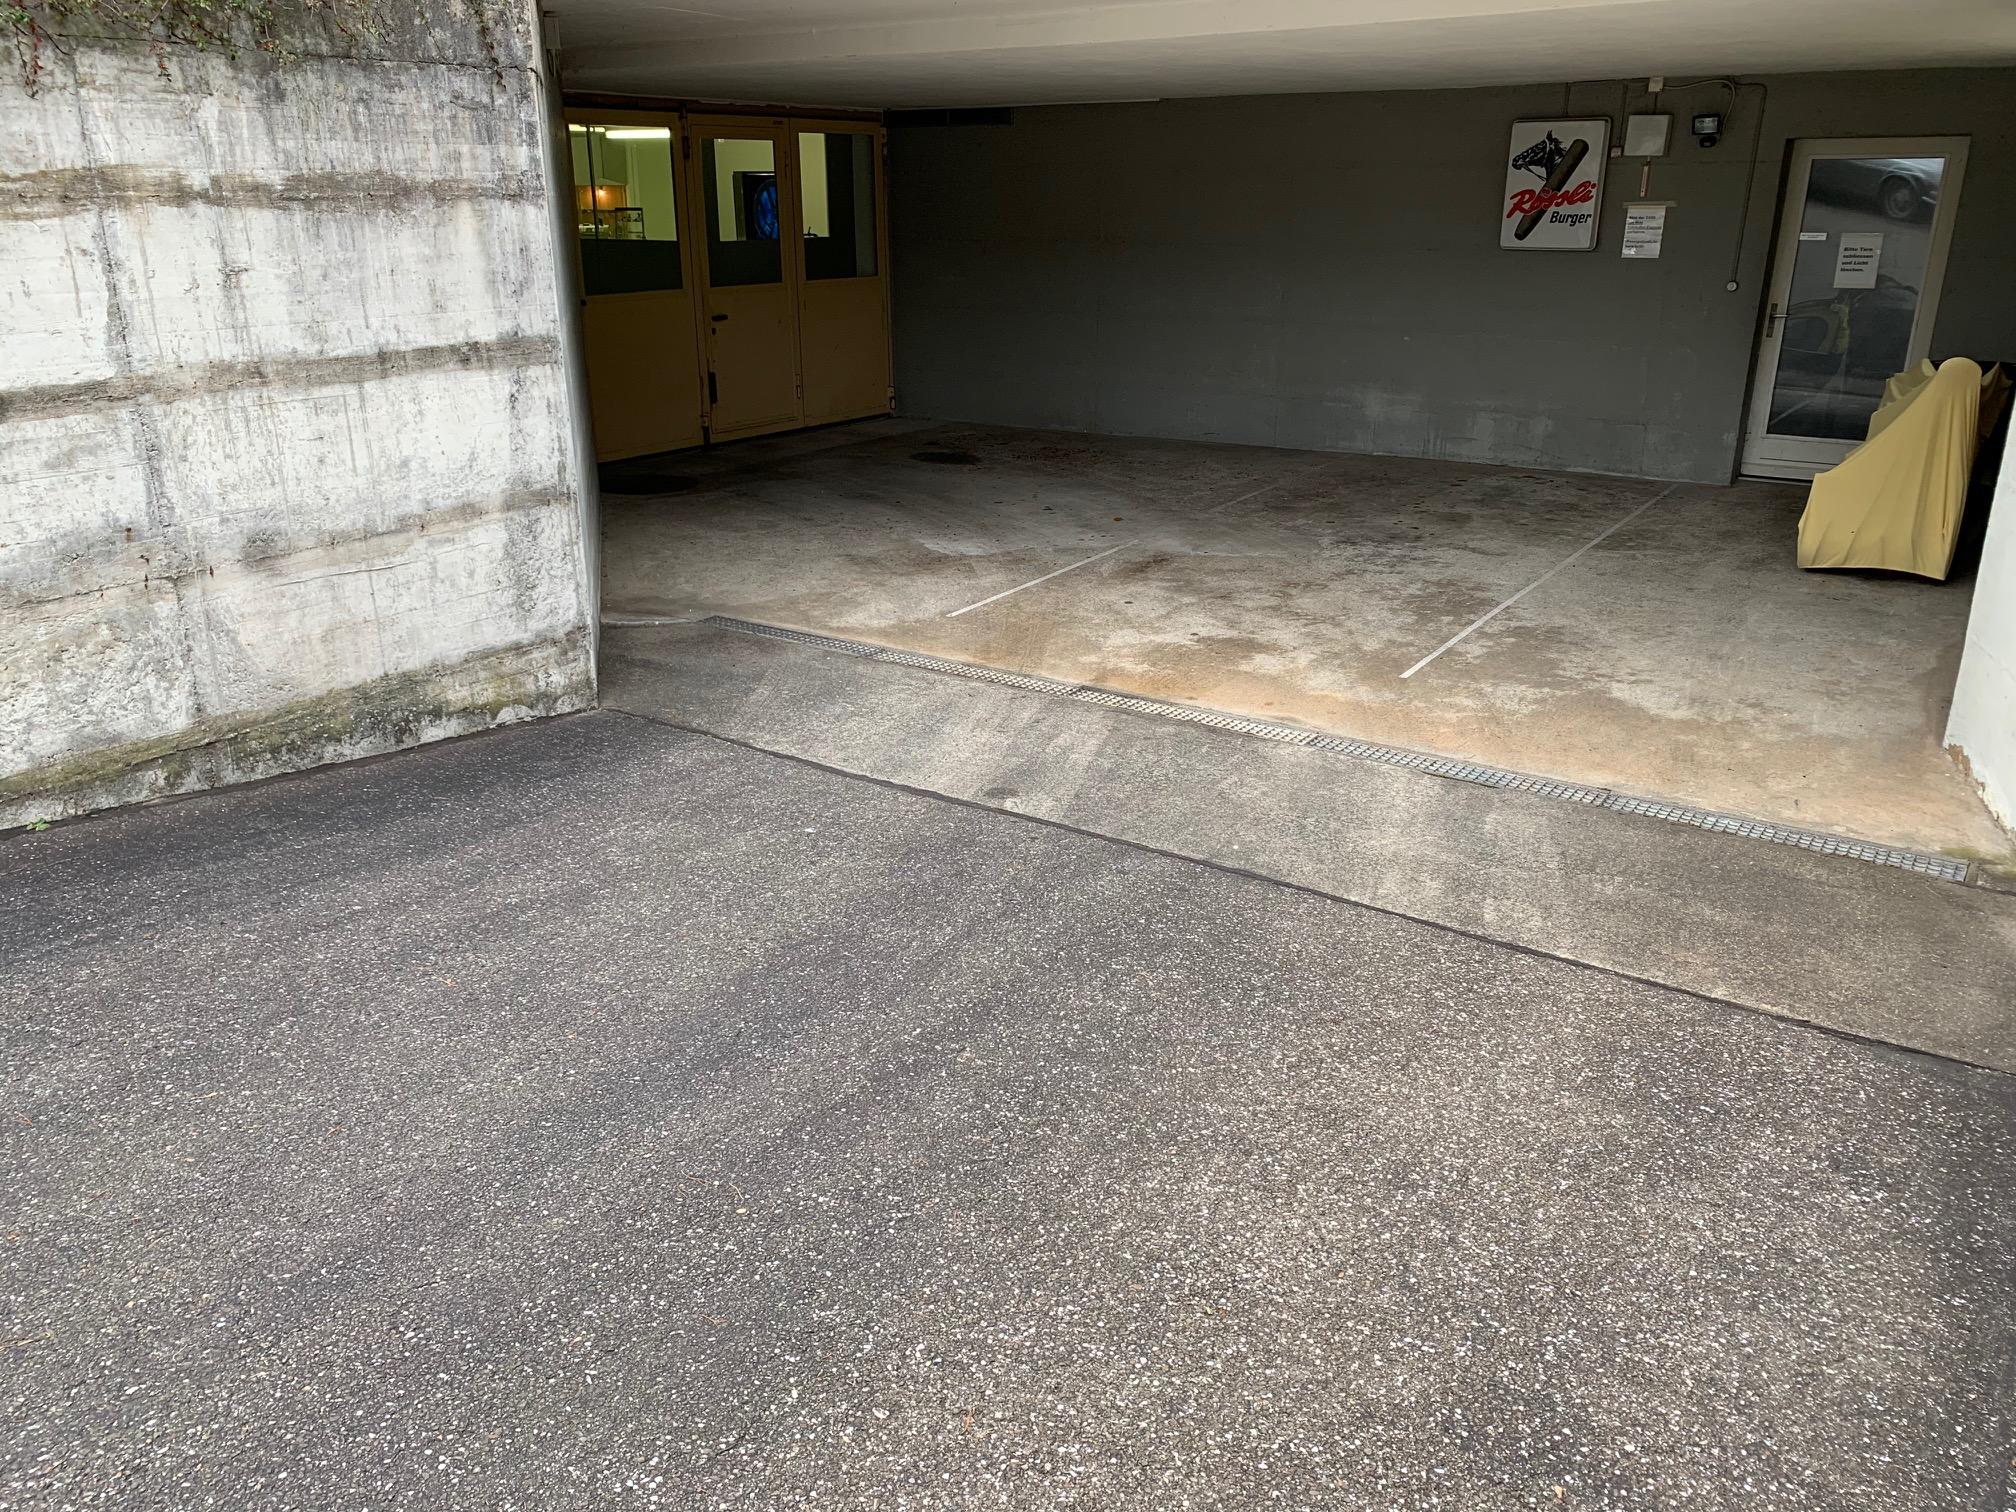 Eingang VW-Käfer-Bar